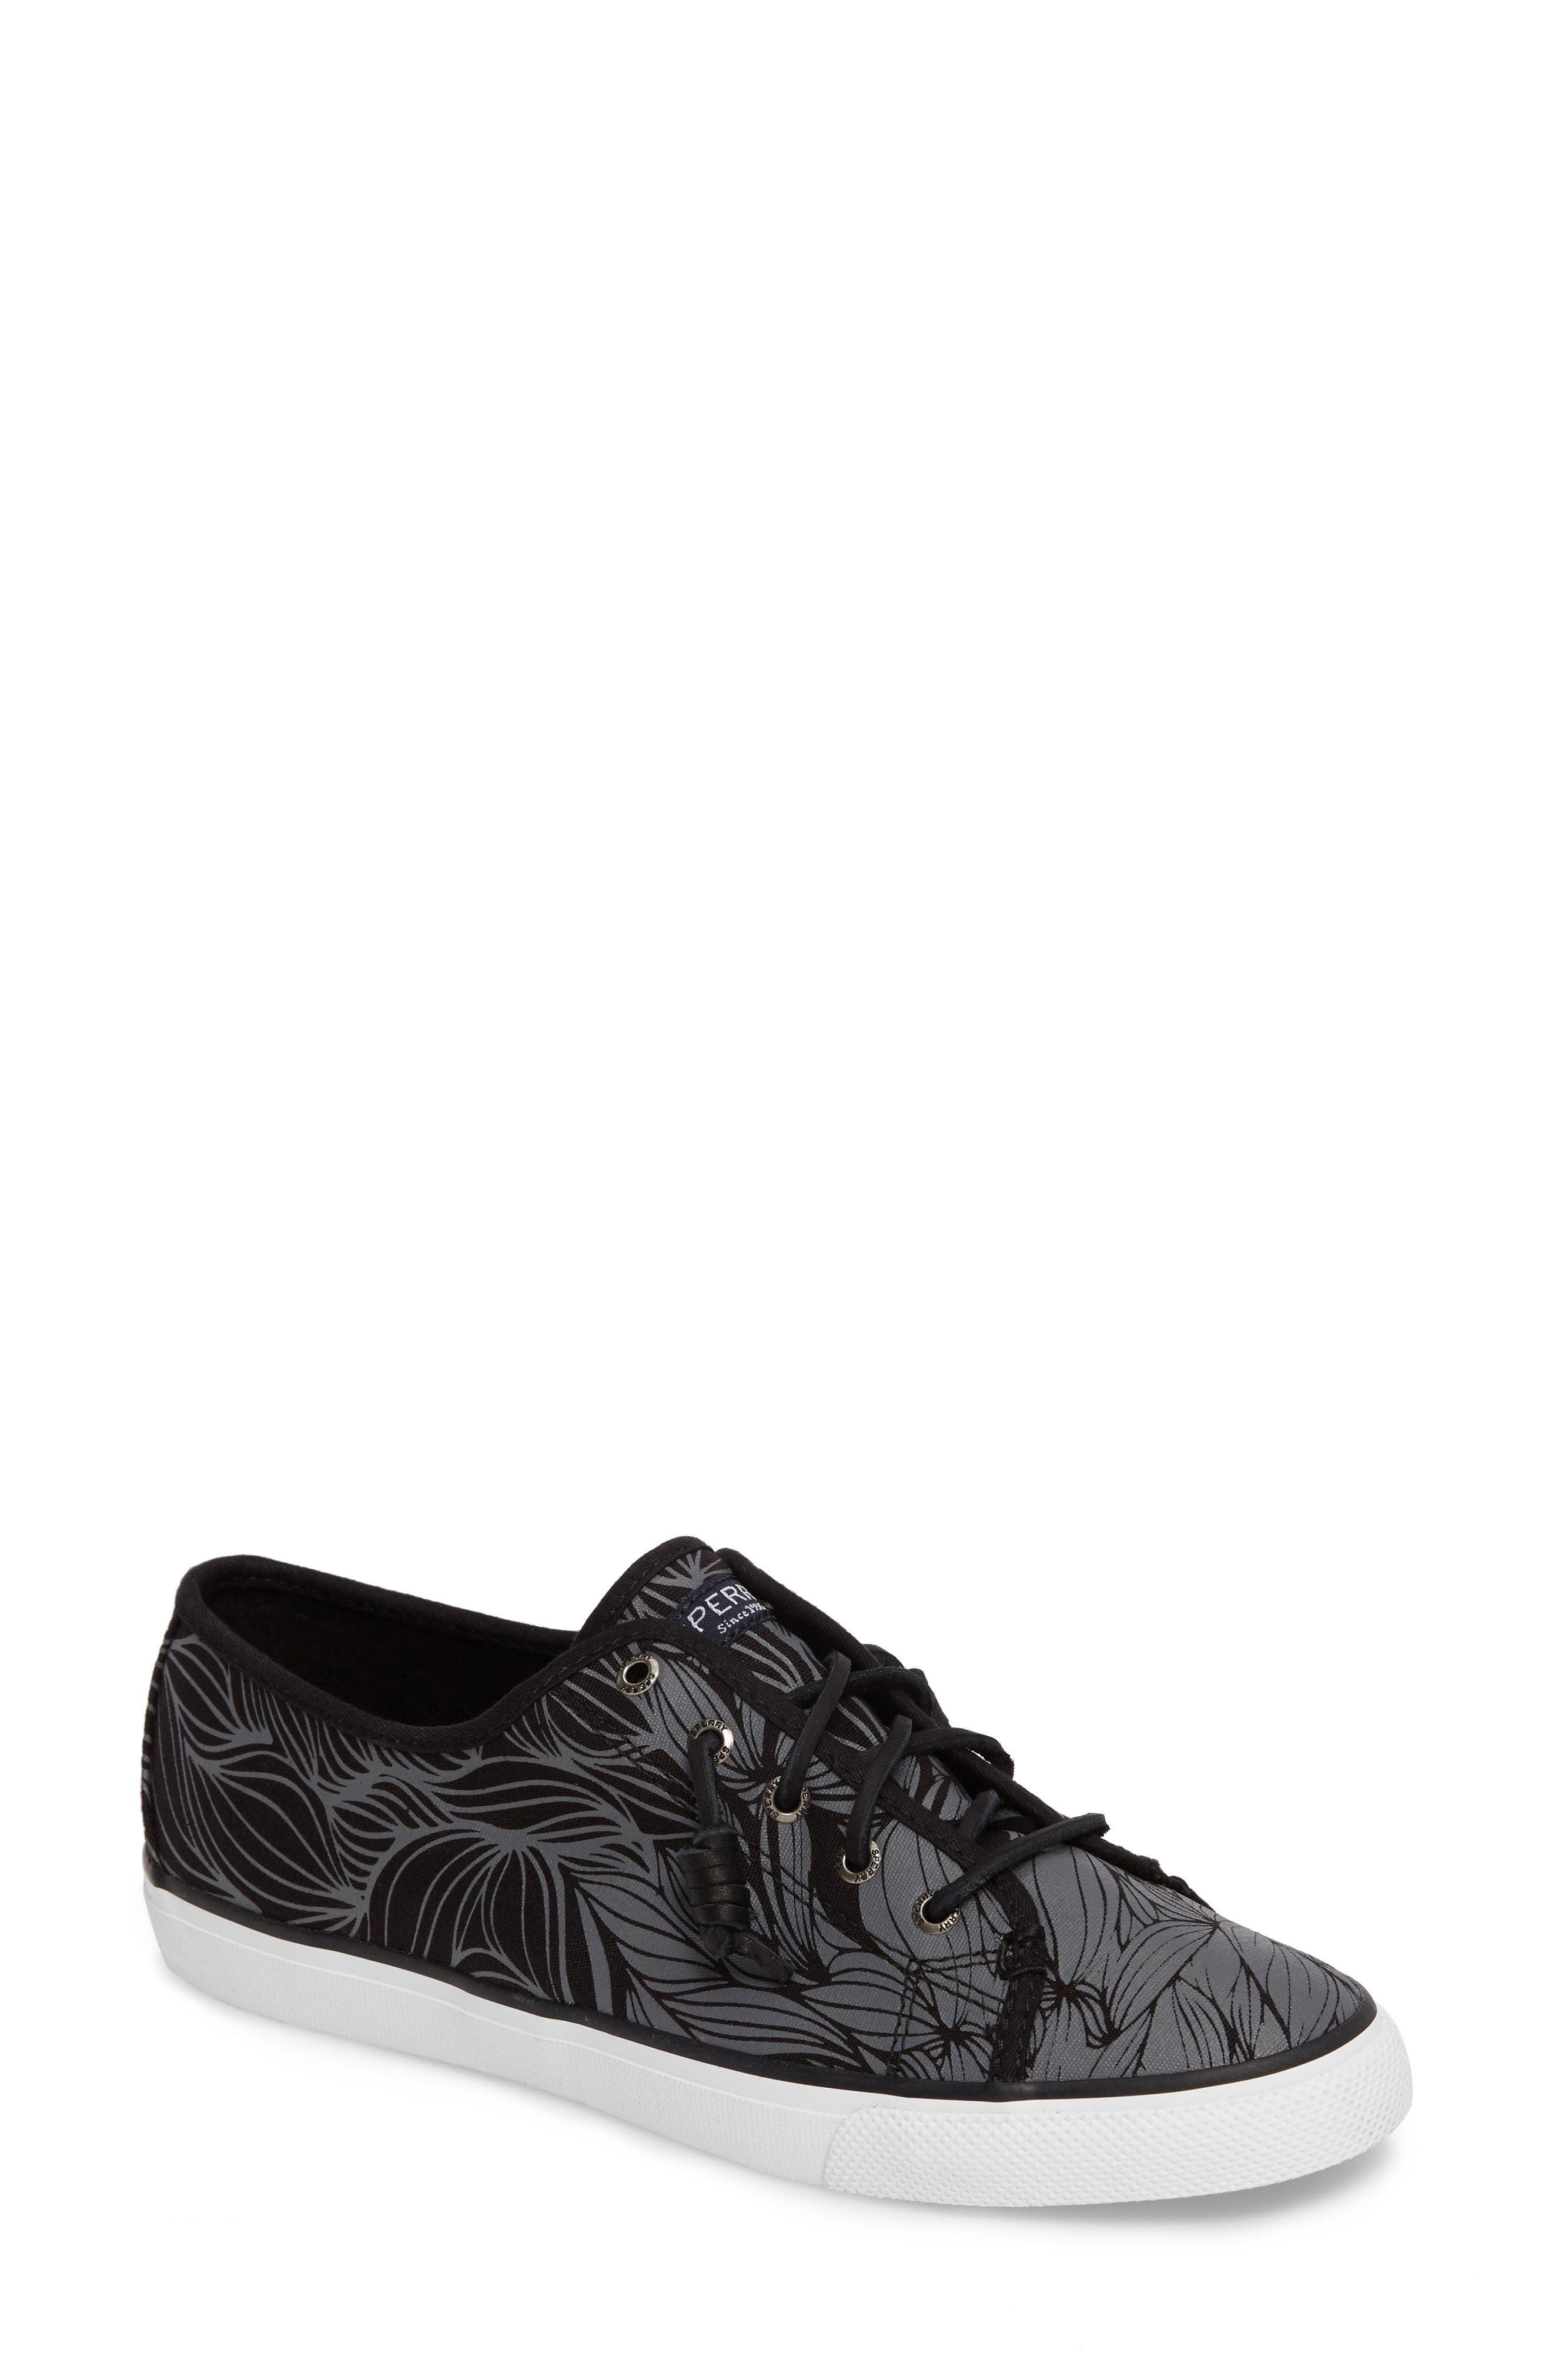 Alternate Image 1 Selected - Sperry 'Seacoast' Sneaker (Women)